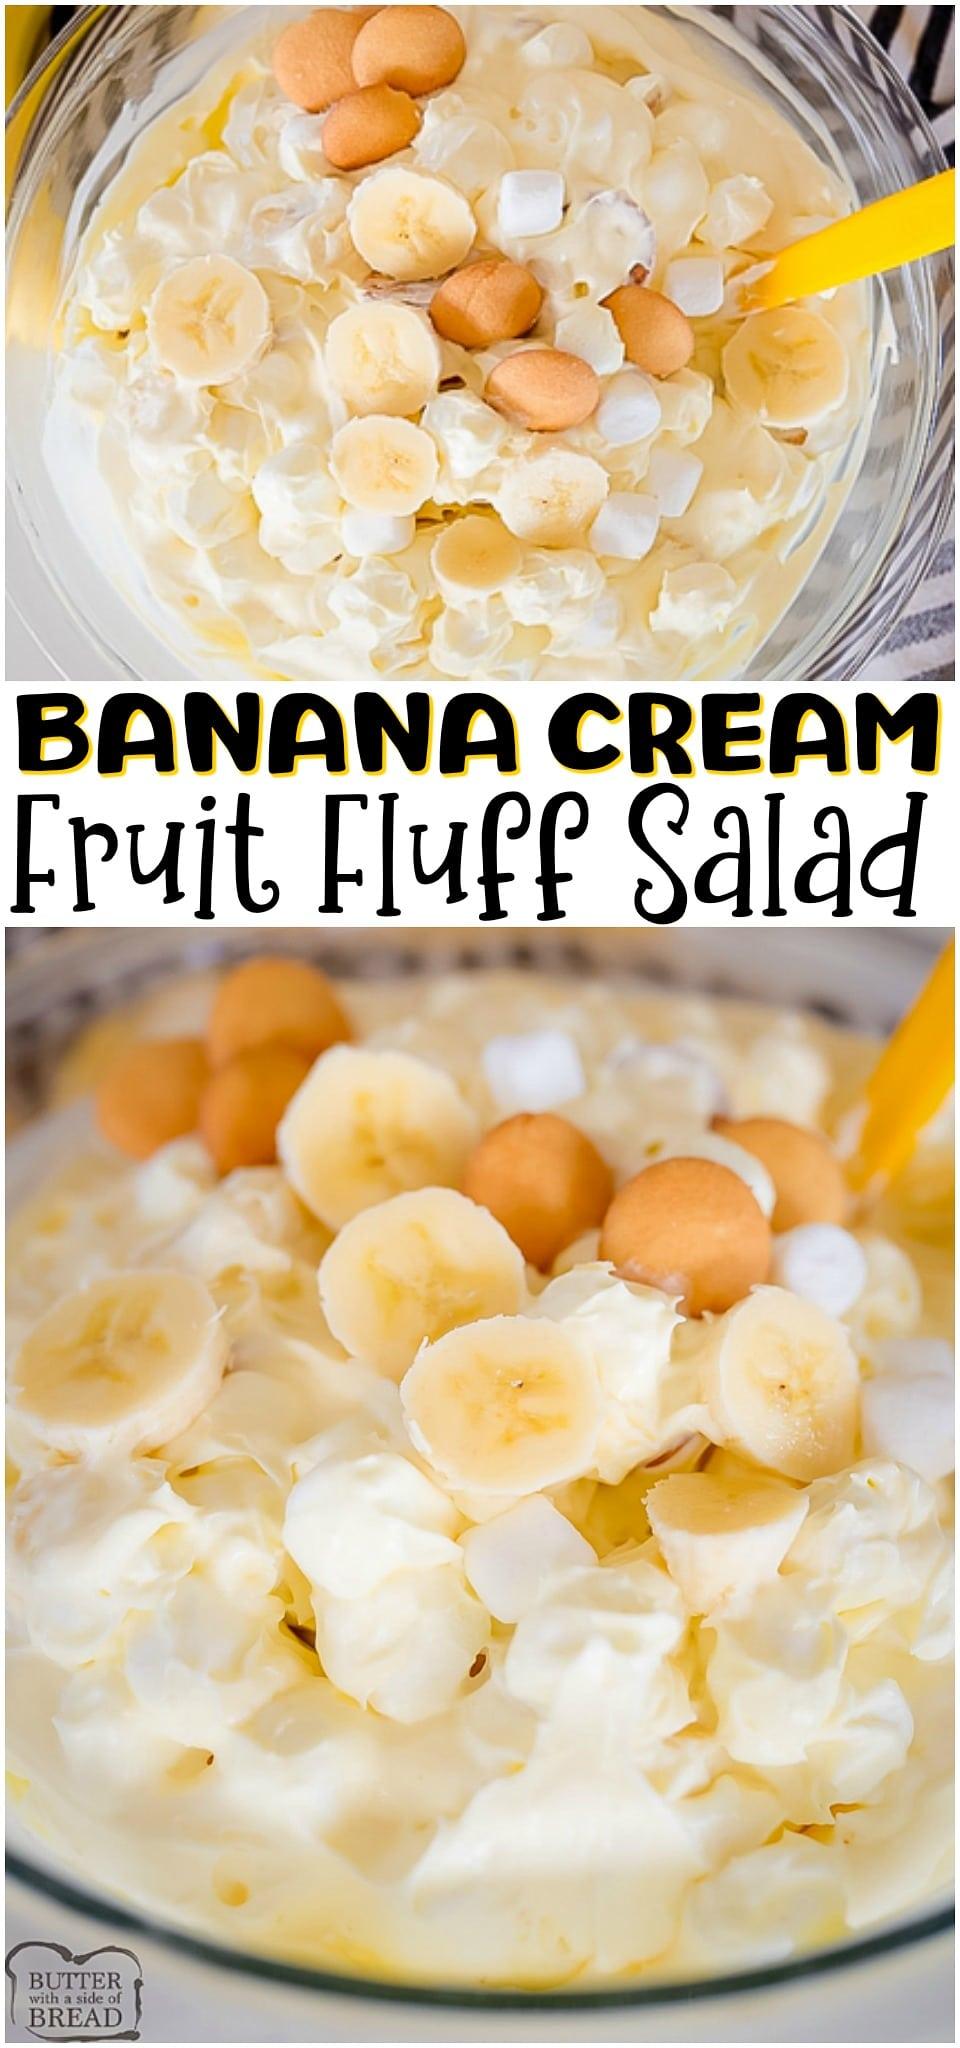 Banana Cream Fluff Salad made with bananas, yogurt, pudding mix and sweet cream. Perfect 10-minute sweet dessert salad for banana cream pie lovers!